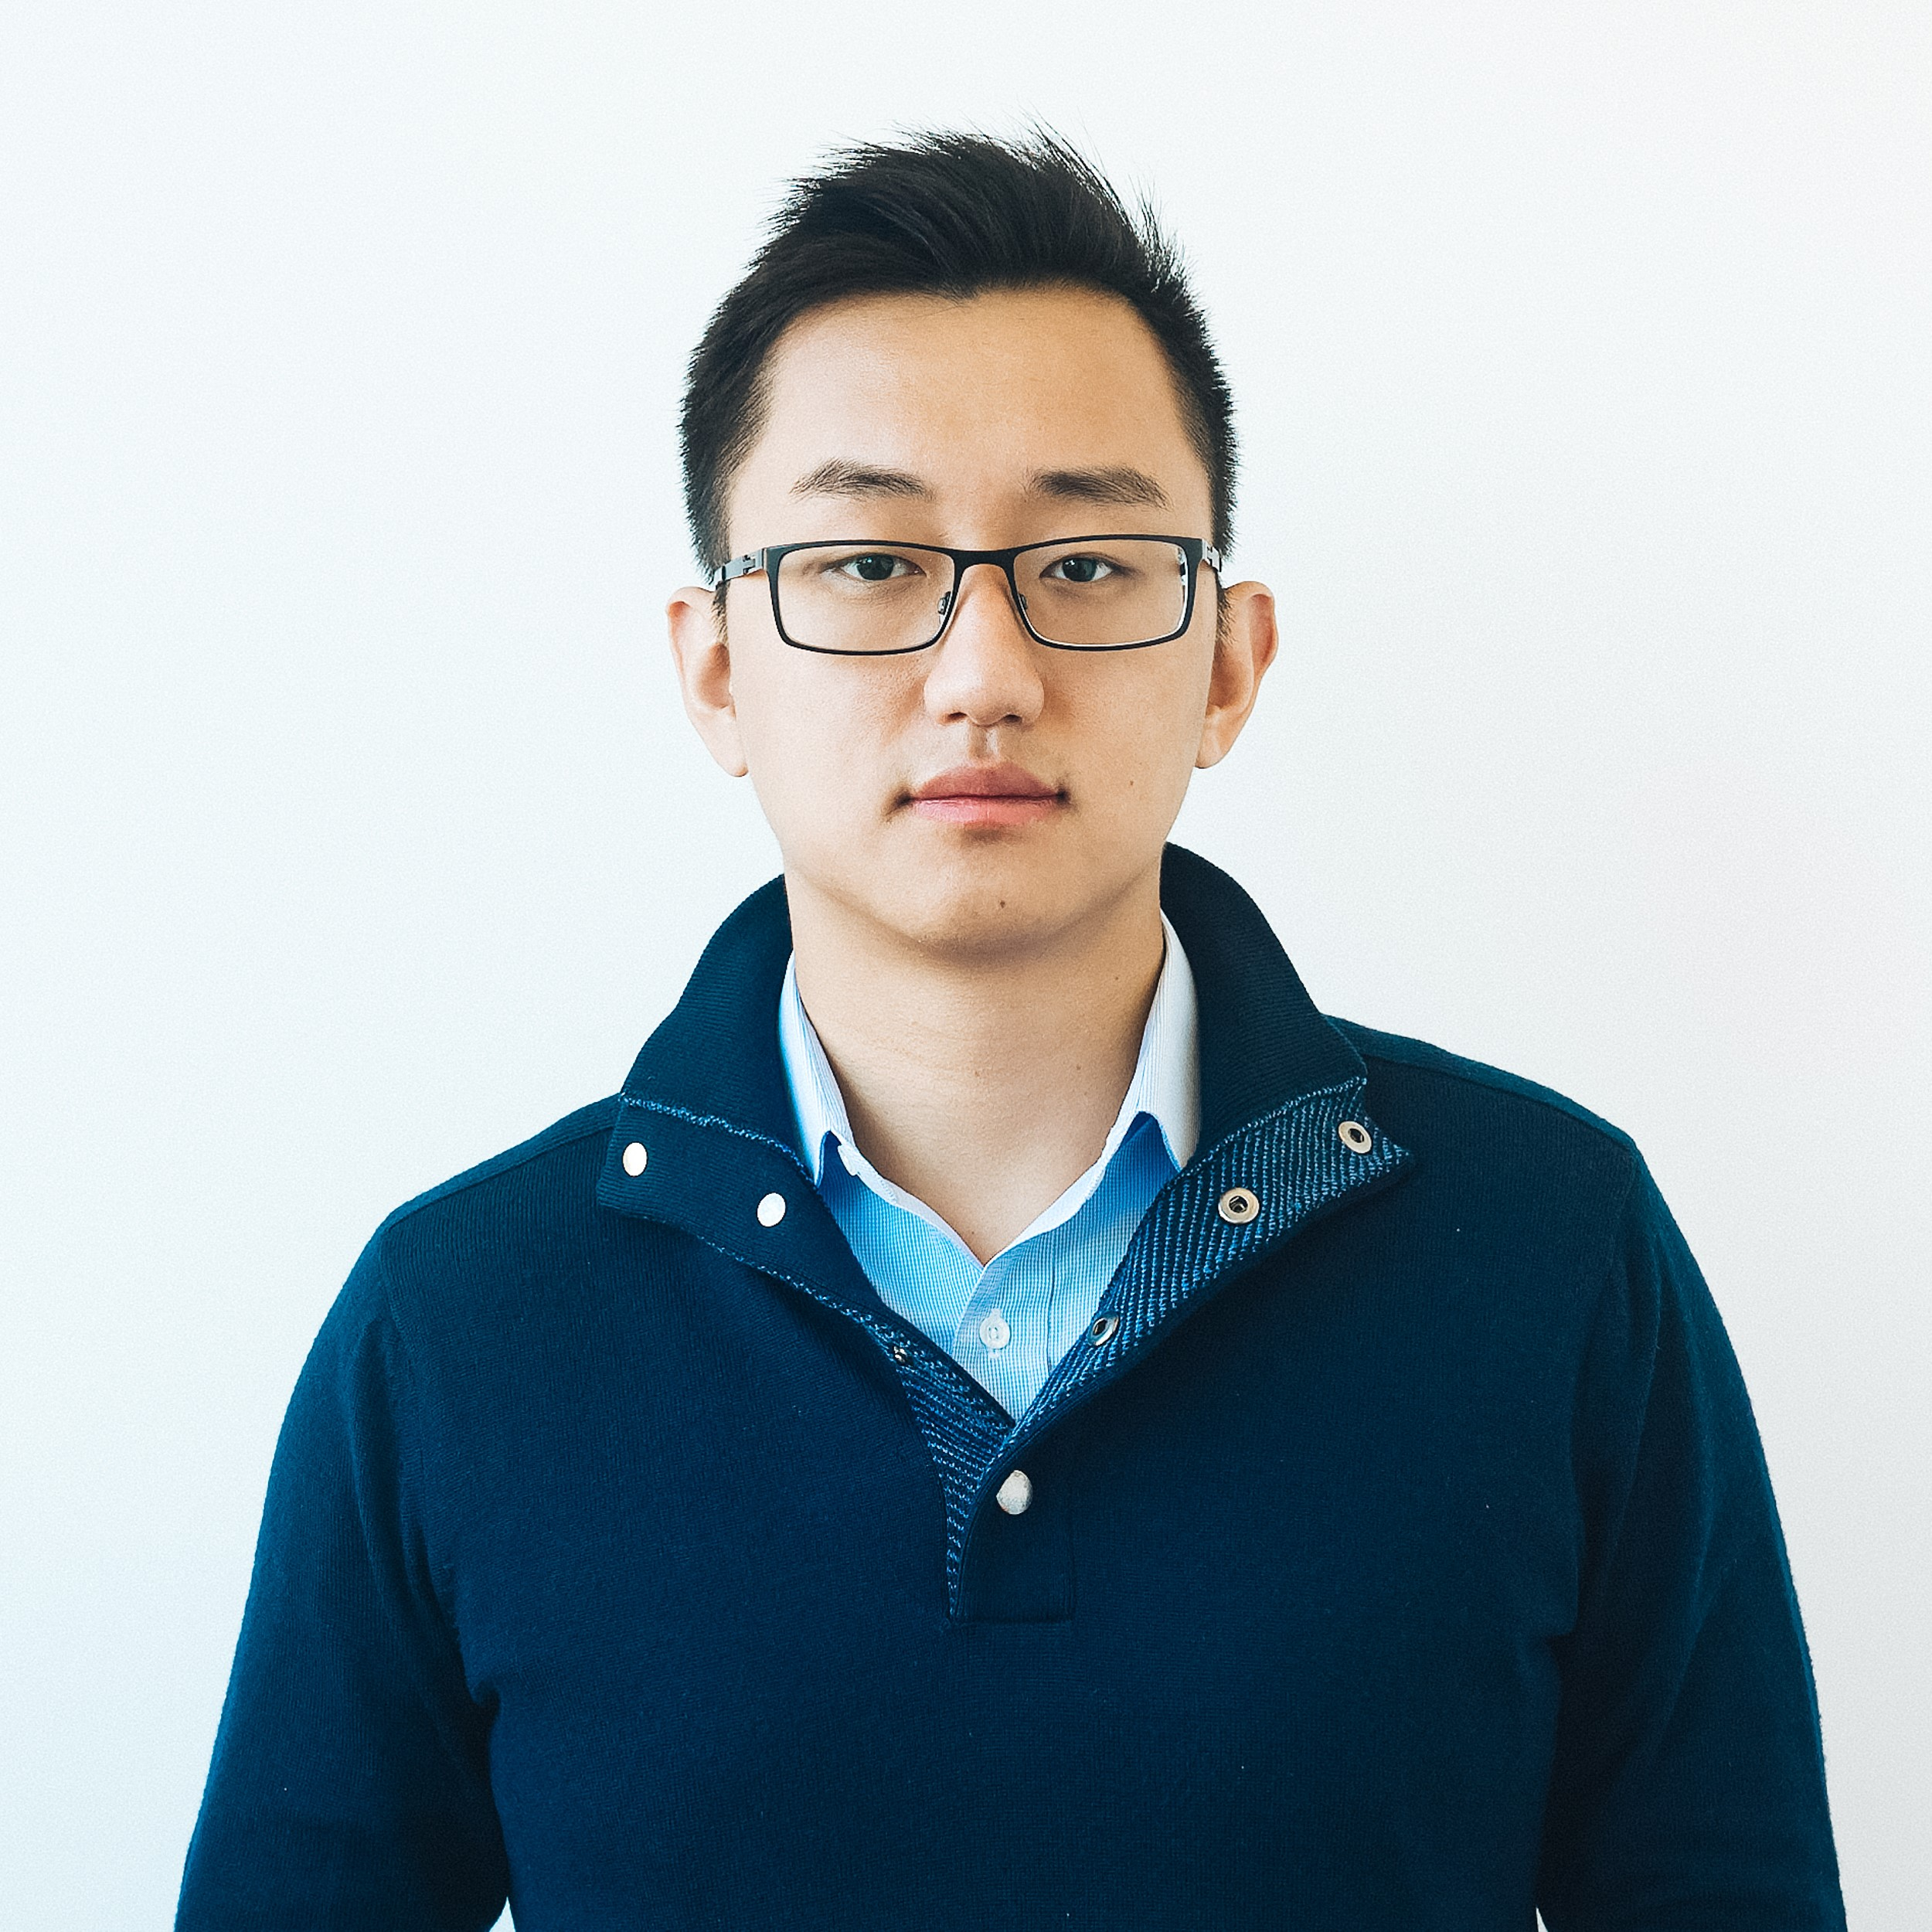 Michael Shang